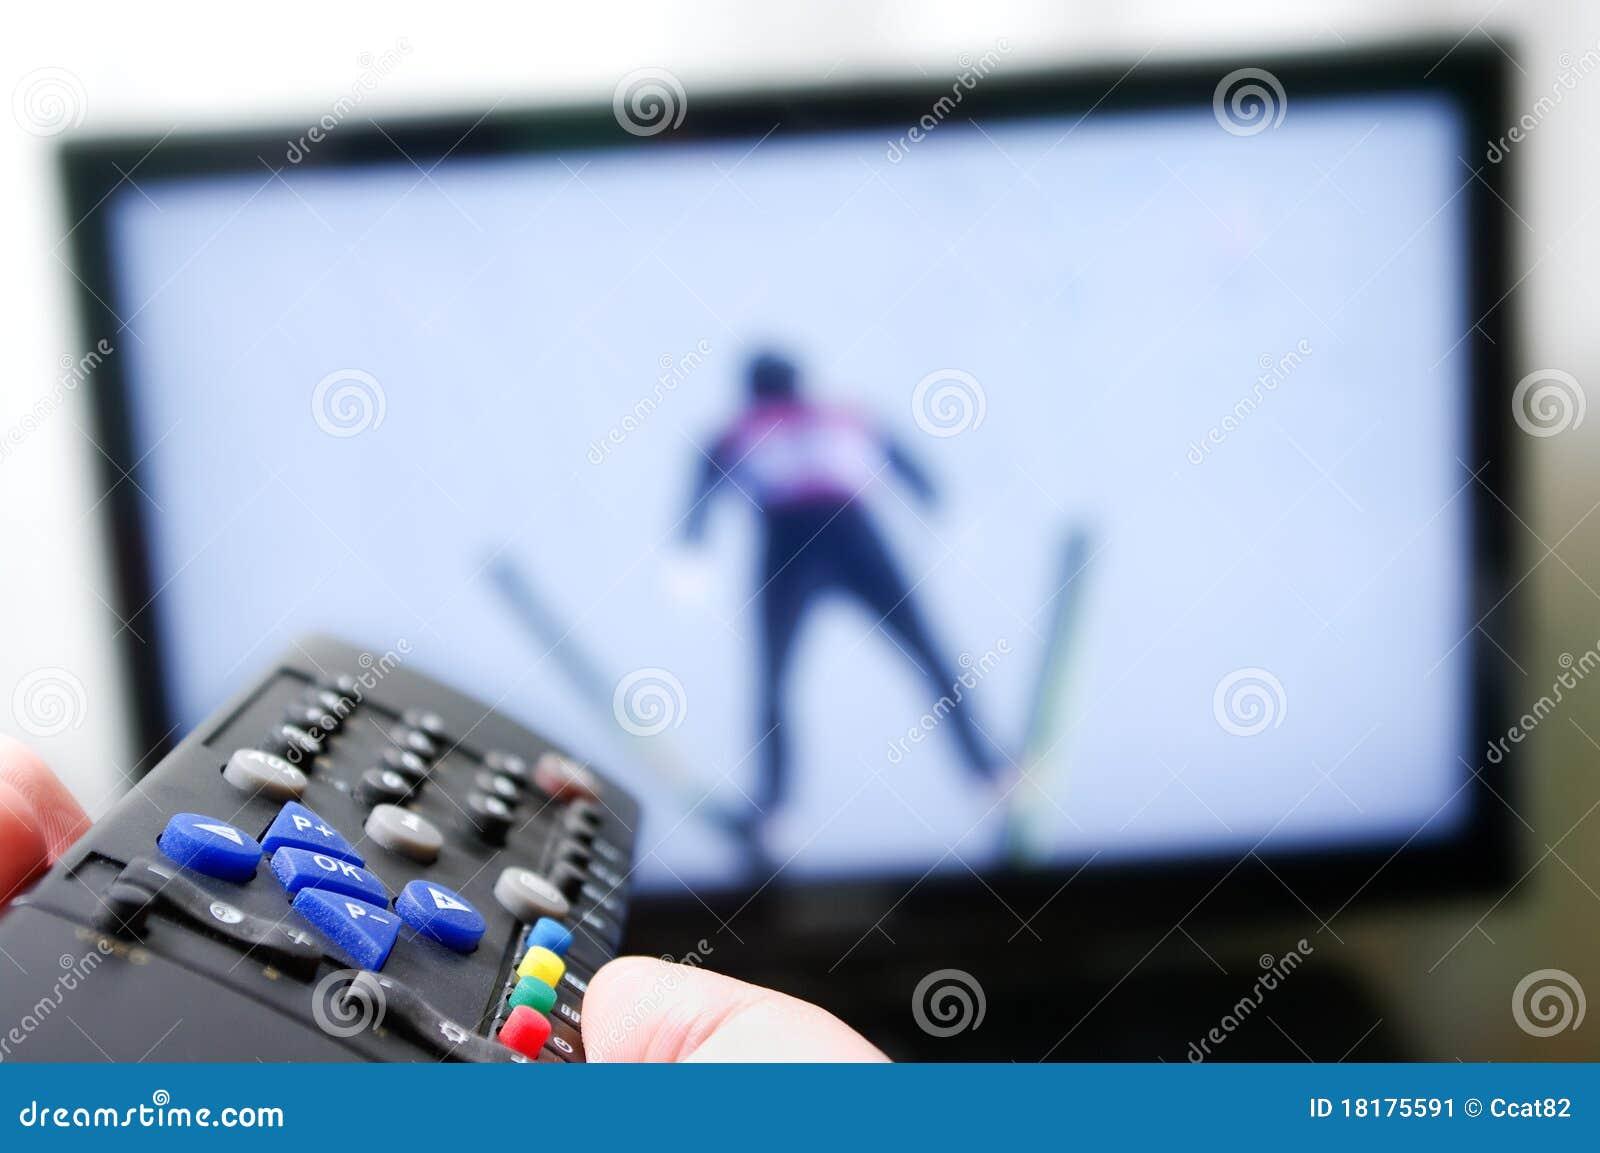 Remote control - ski jumping